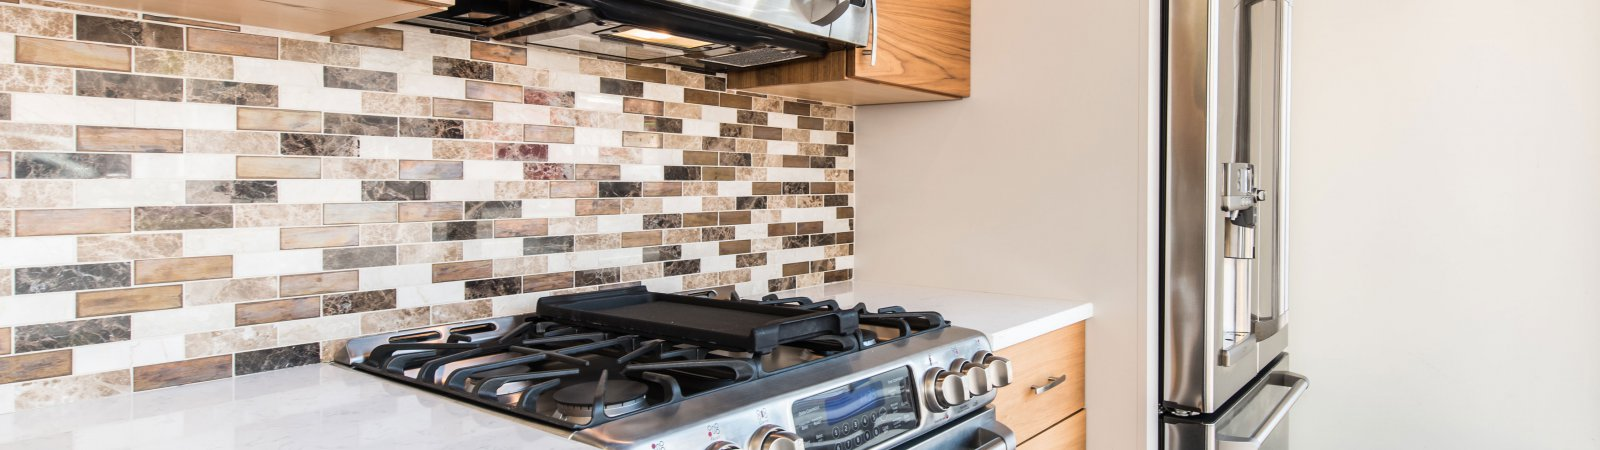 Kitchen Appliance Stores Fairfax Va